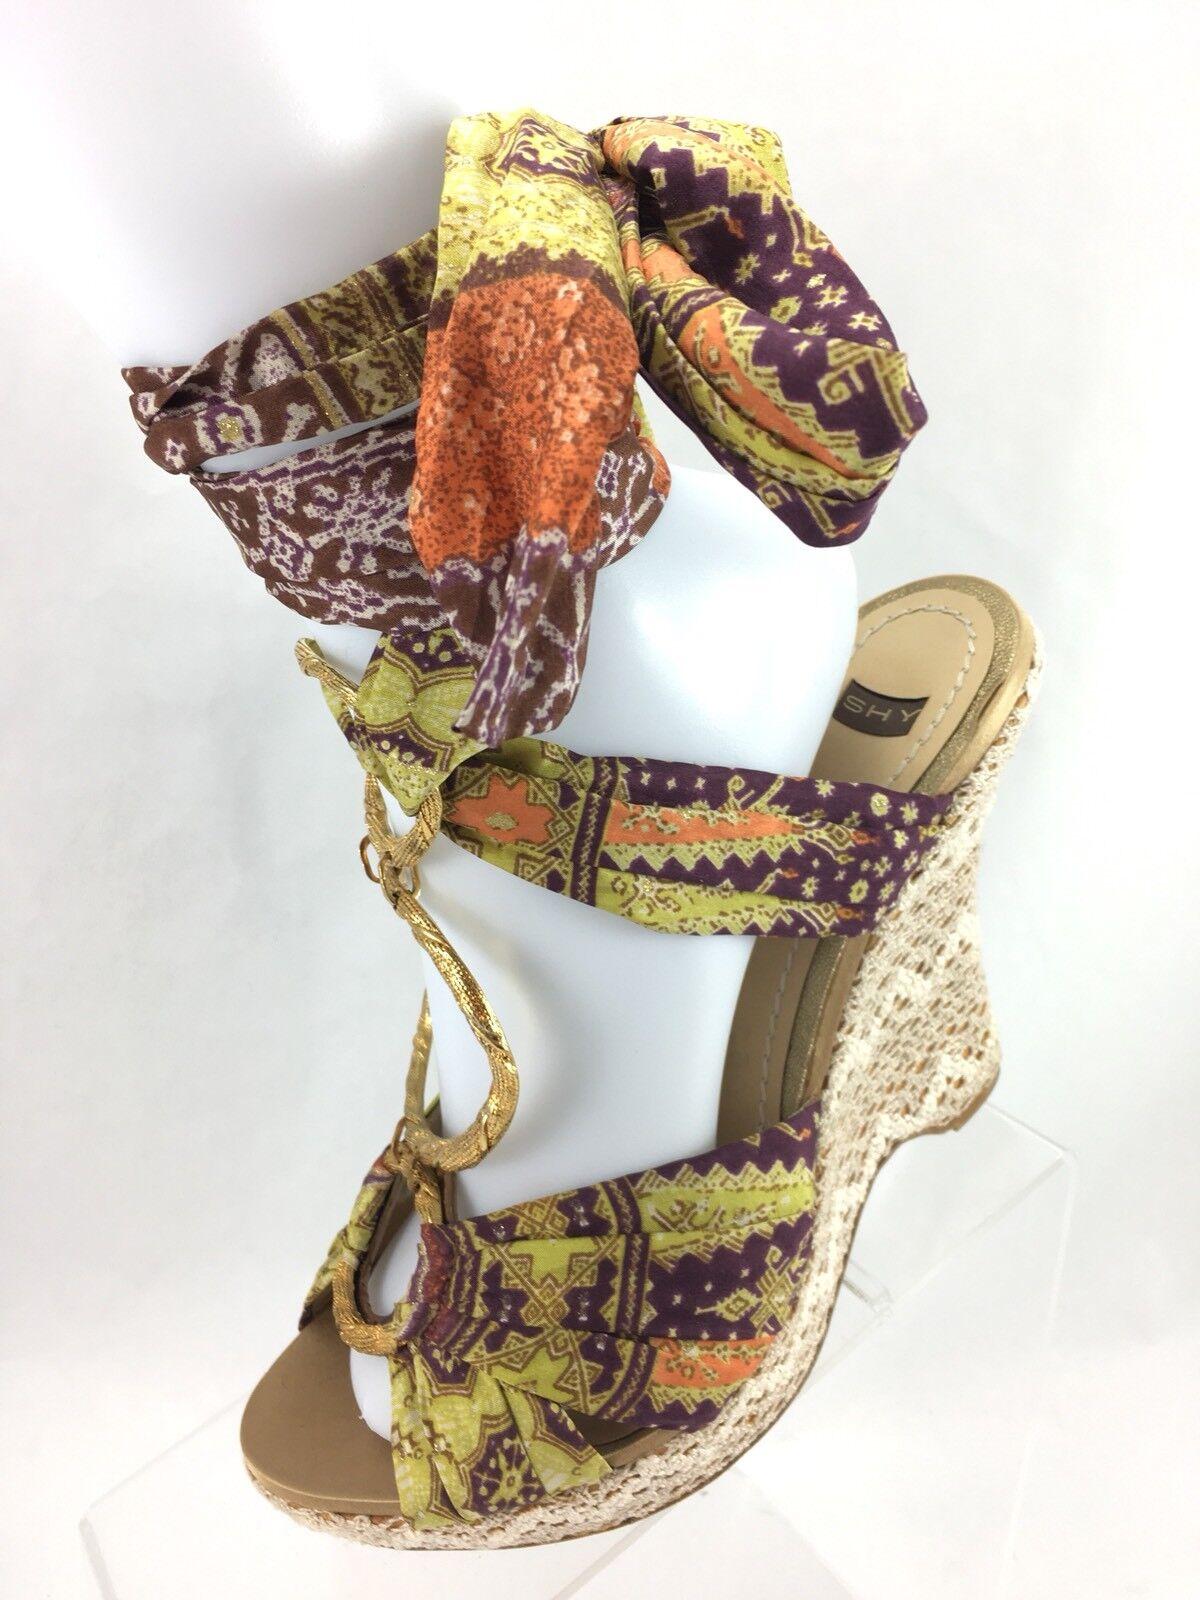 incentivi promozionali SH3 Shy US 8.5 EUR 39  Made Platform Wedge Wedge Wedge Heel scarpe Lace Embellished Tie  miglior servizio